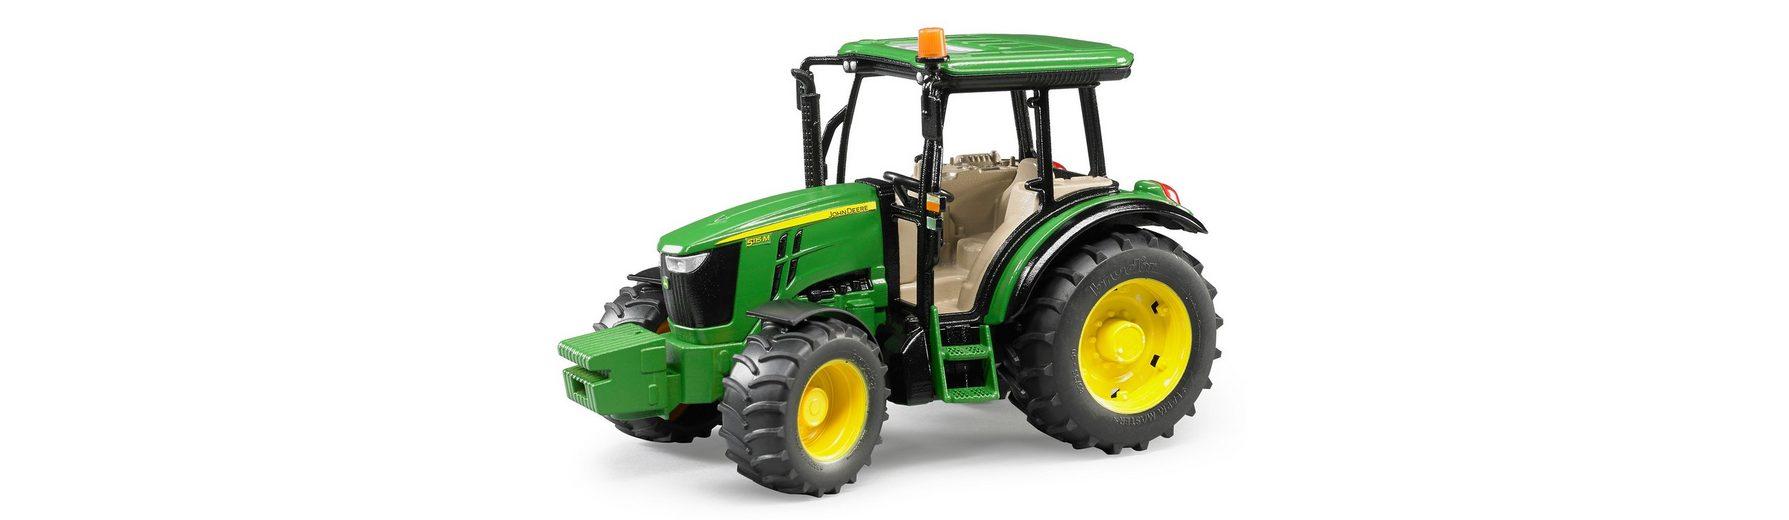 bruder® Spielzeug Traktor, »John Deere 5115M«